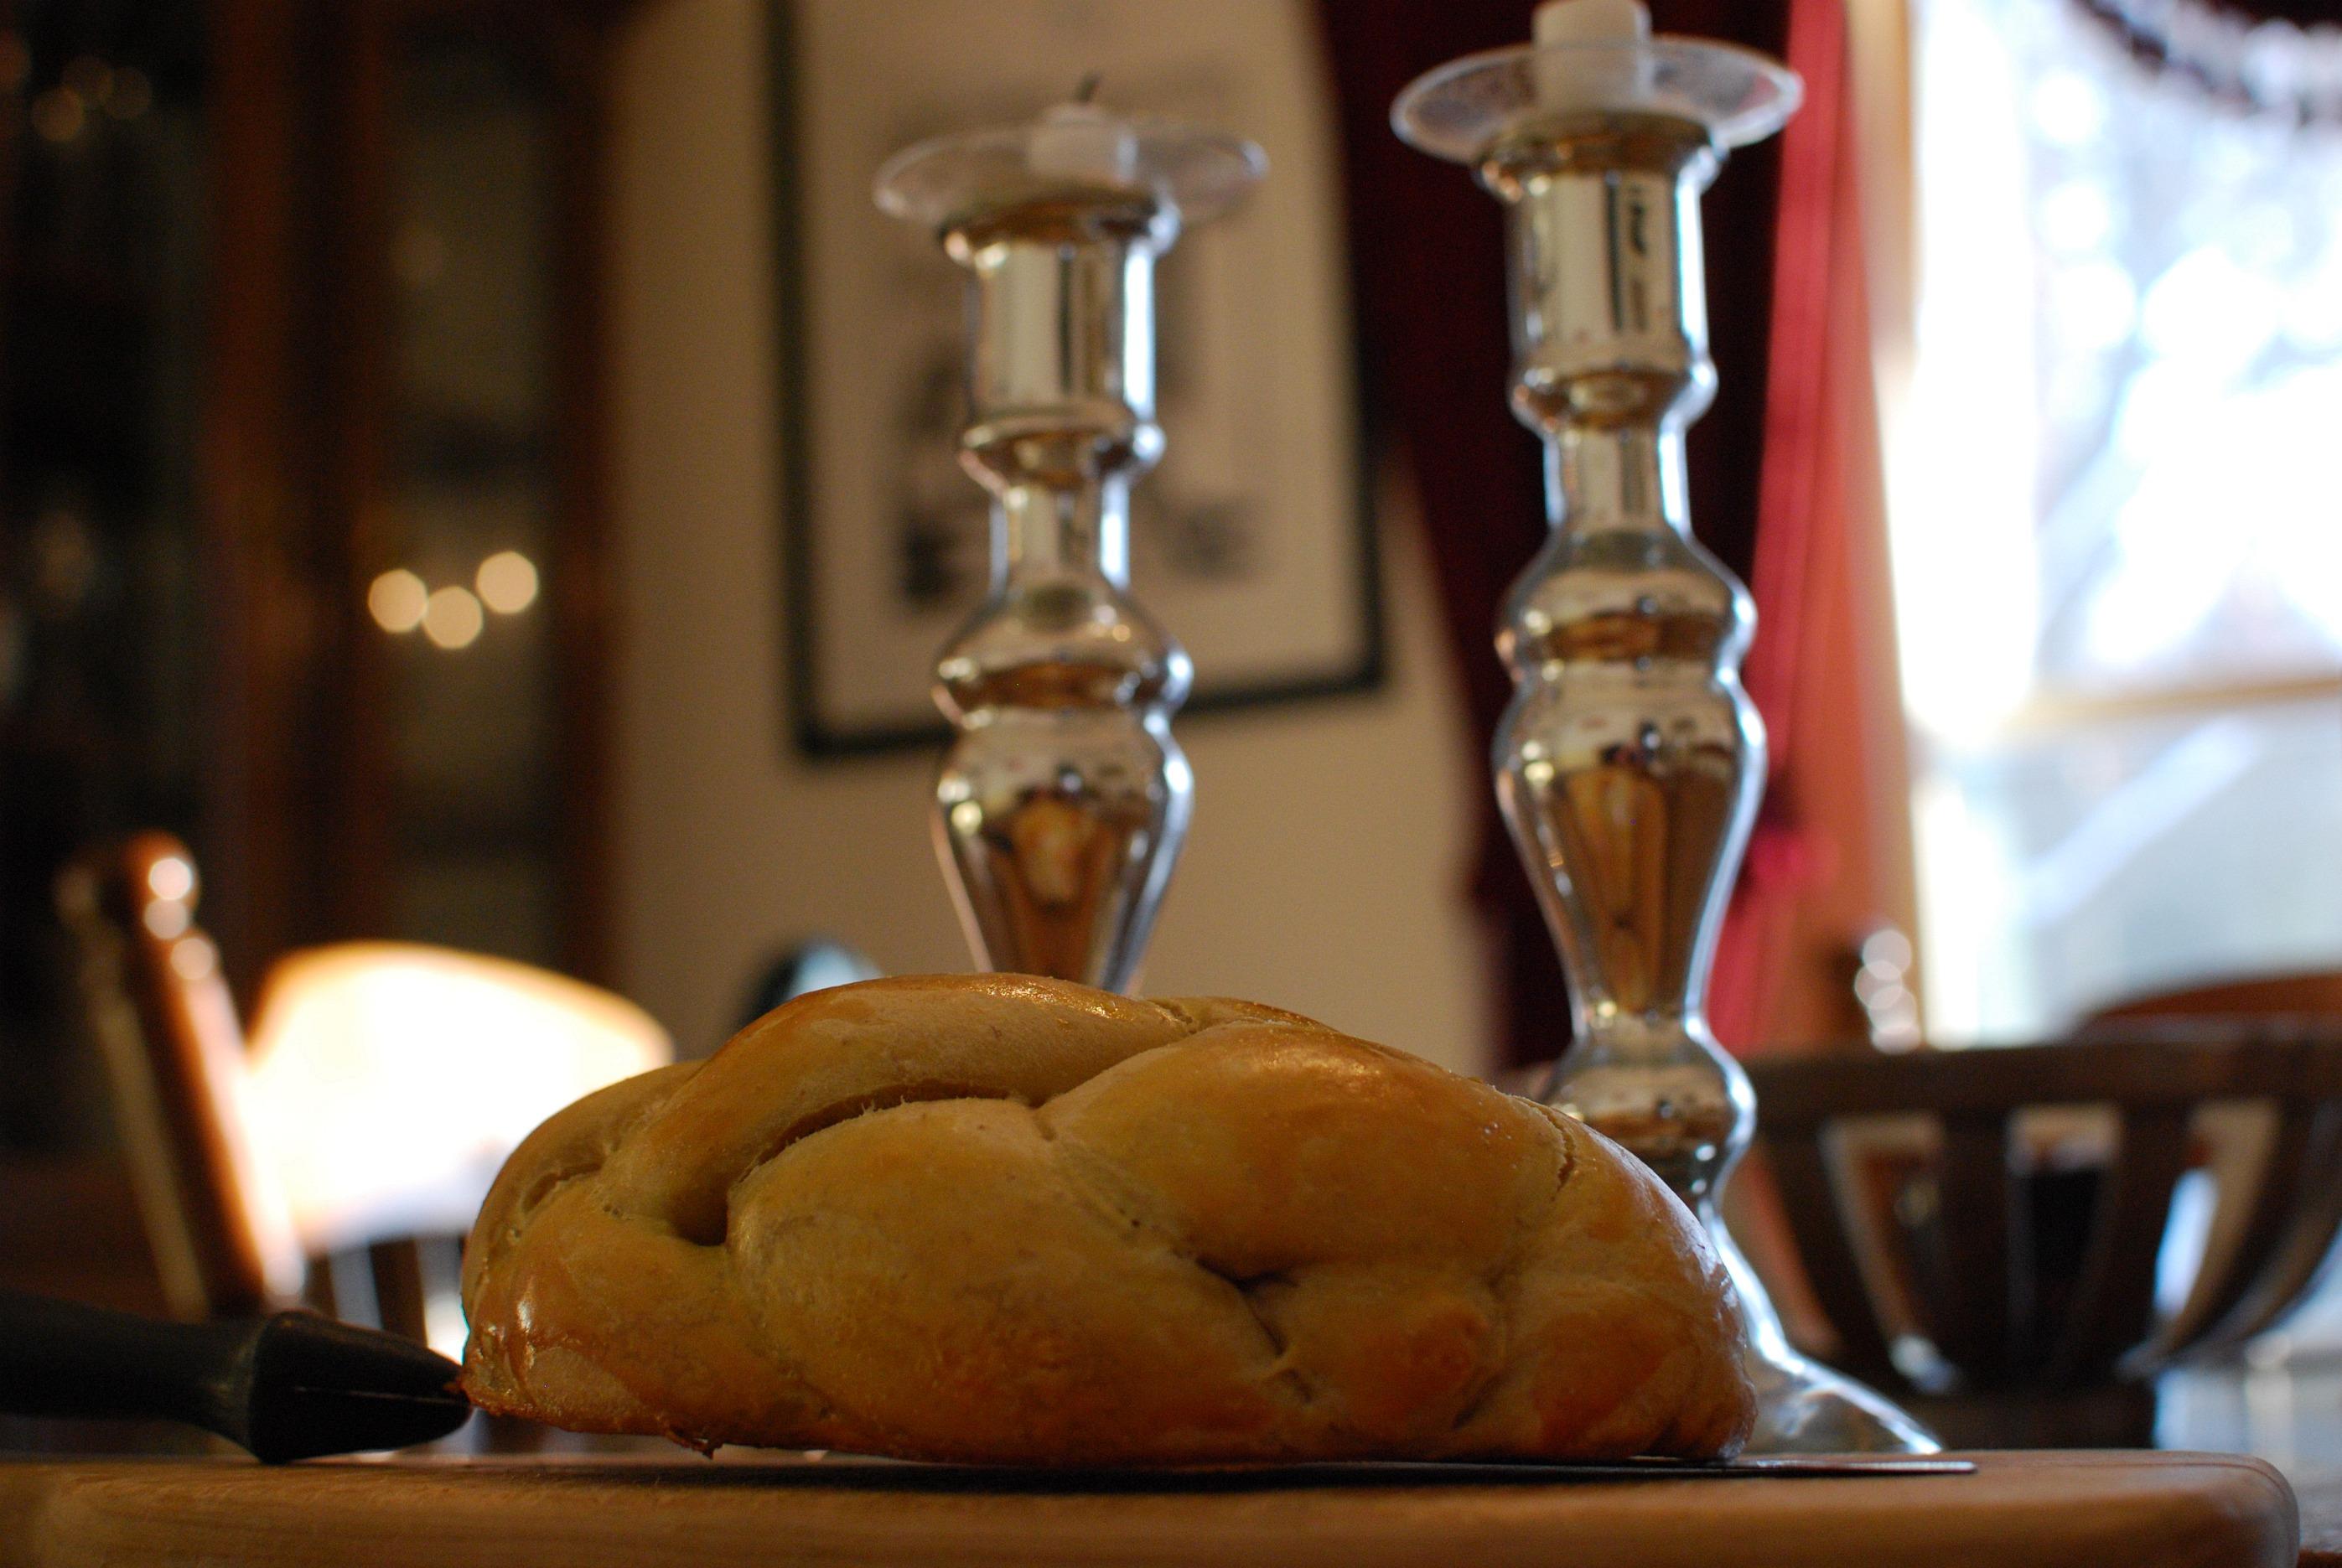 Shabbat Home Ritual: Challah